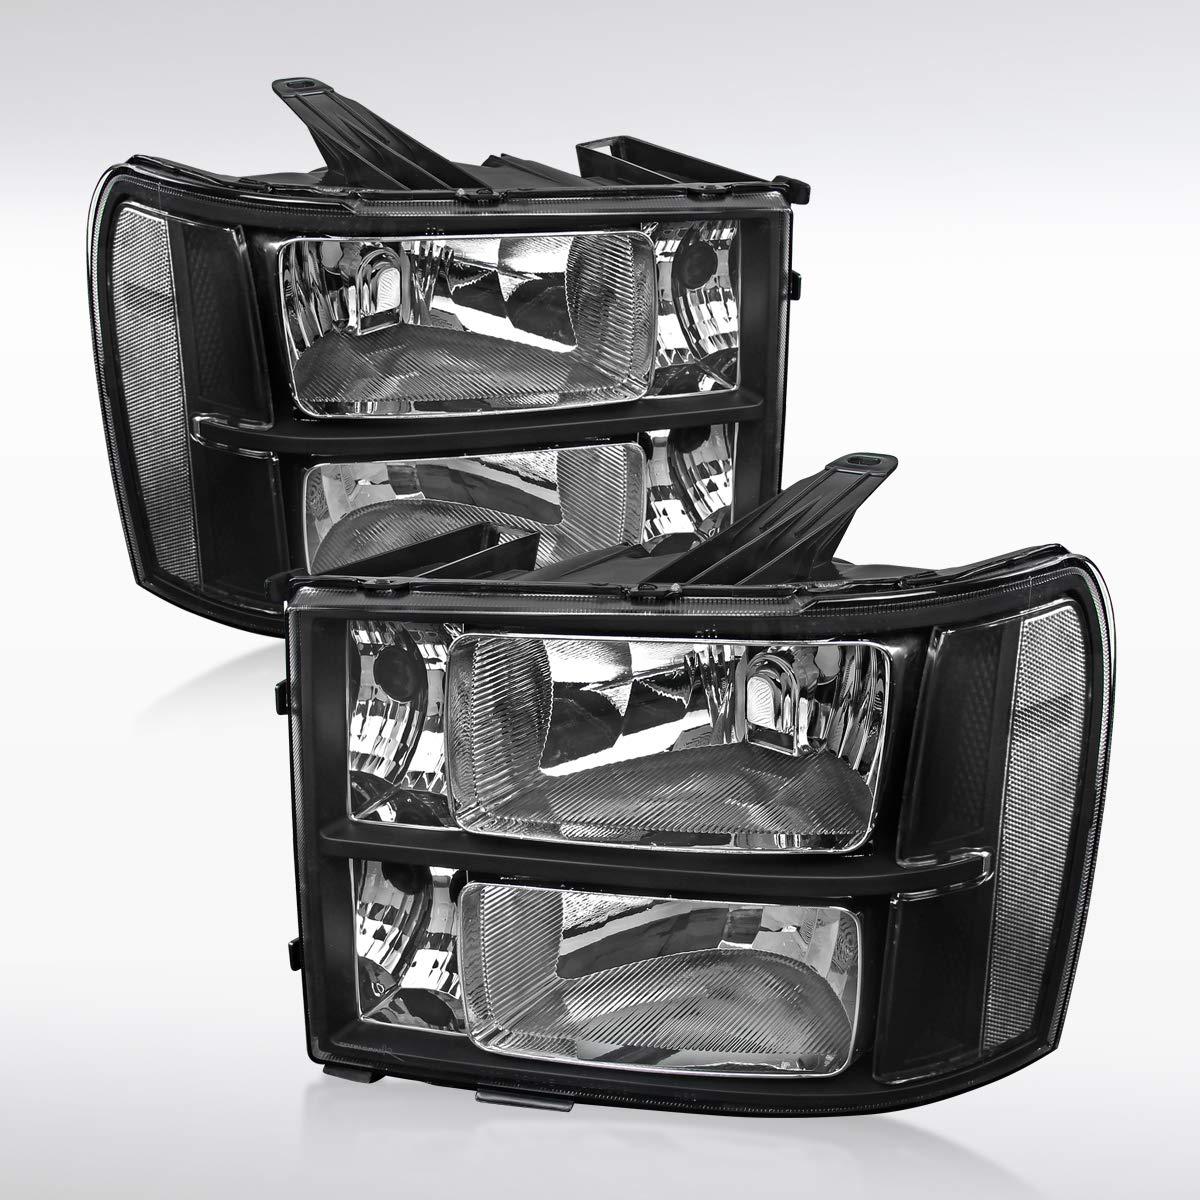 Autozensation For GMC Sierra 1500 2500 3500HD Euro Black Diamond Headlights Left+Right by Autozensation